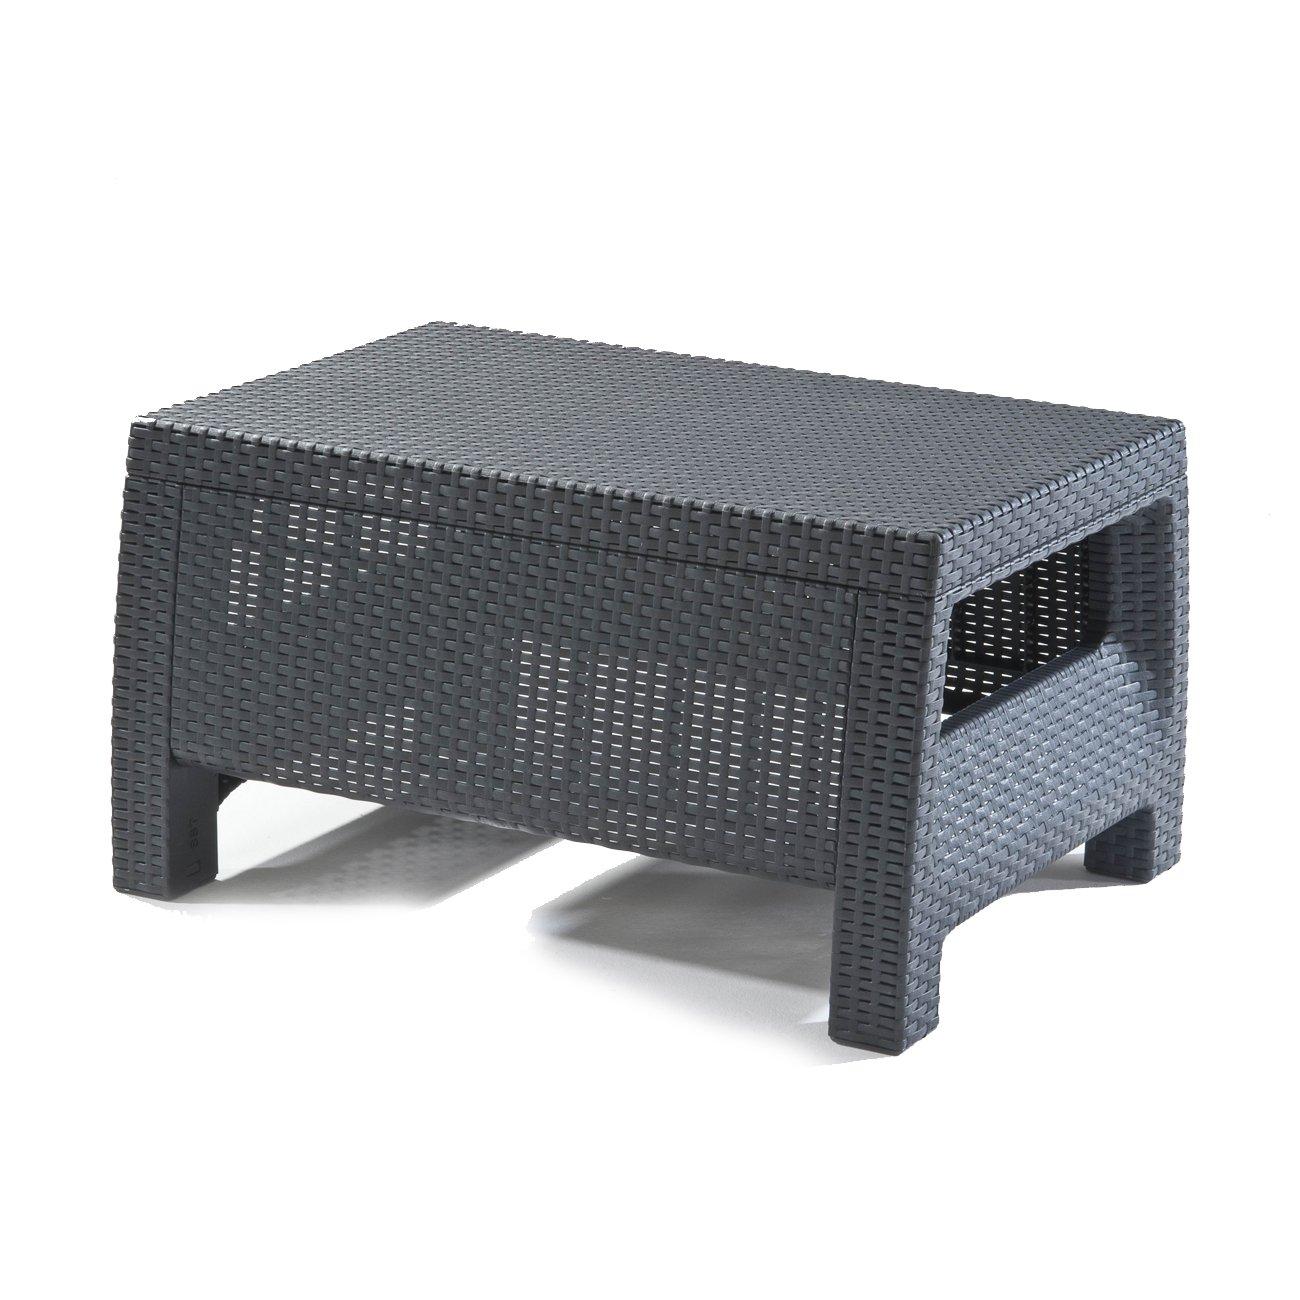 Rattan Outdoor Garden Furniture Coffee Table Durable